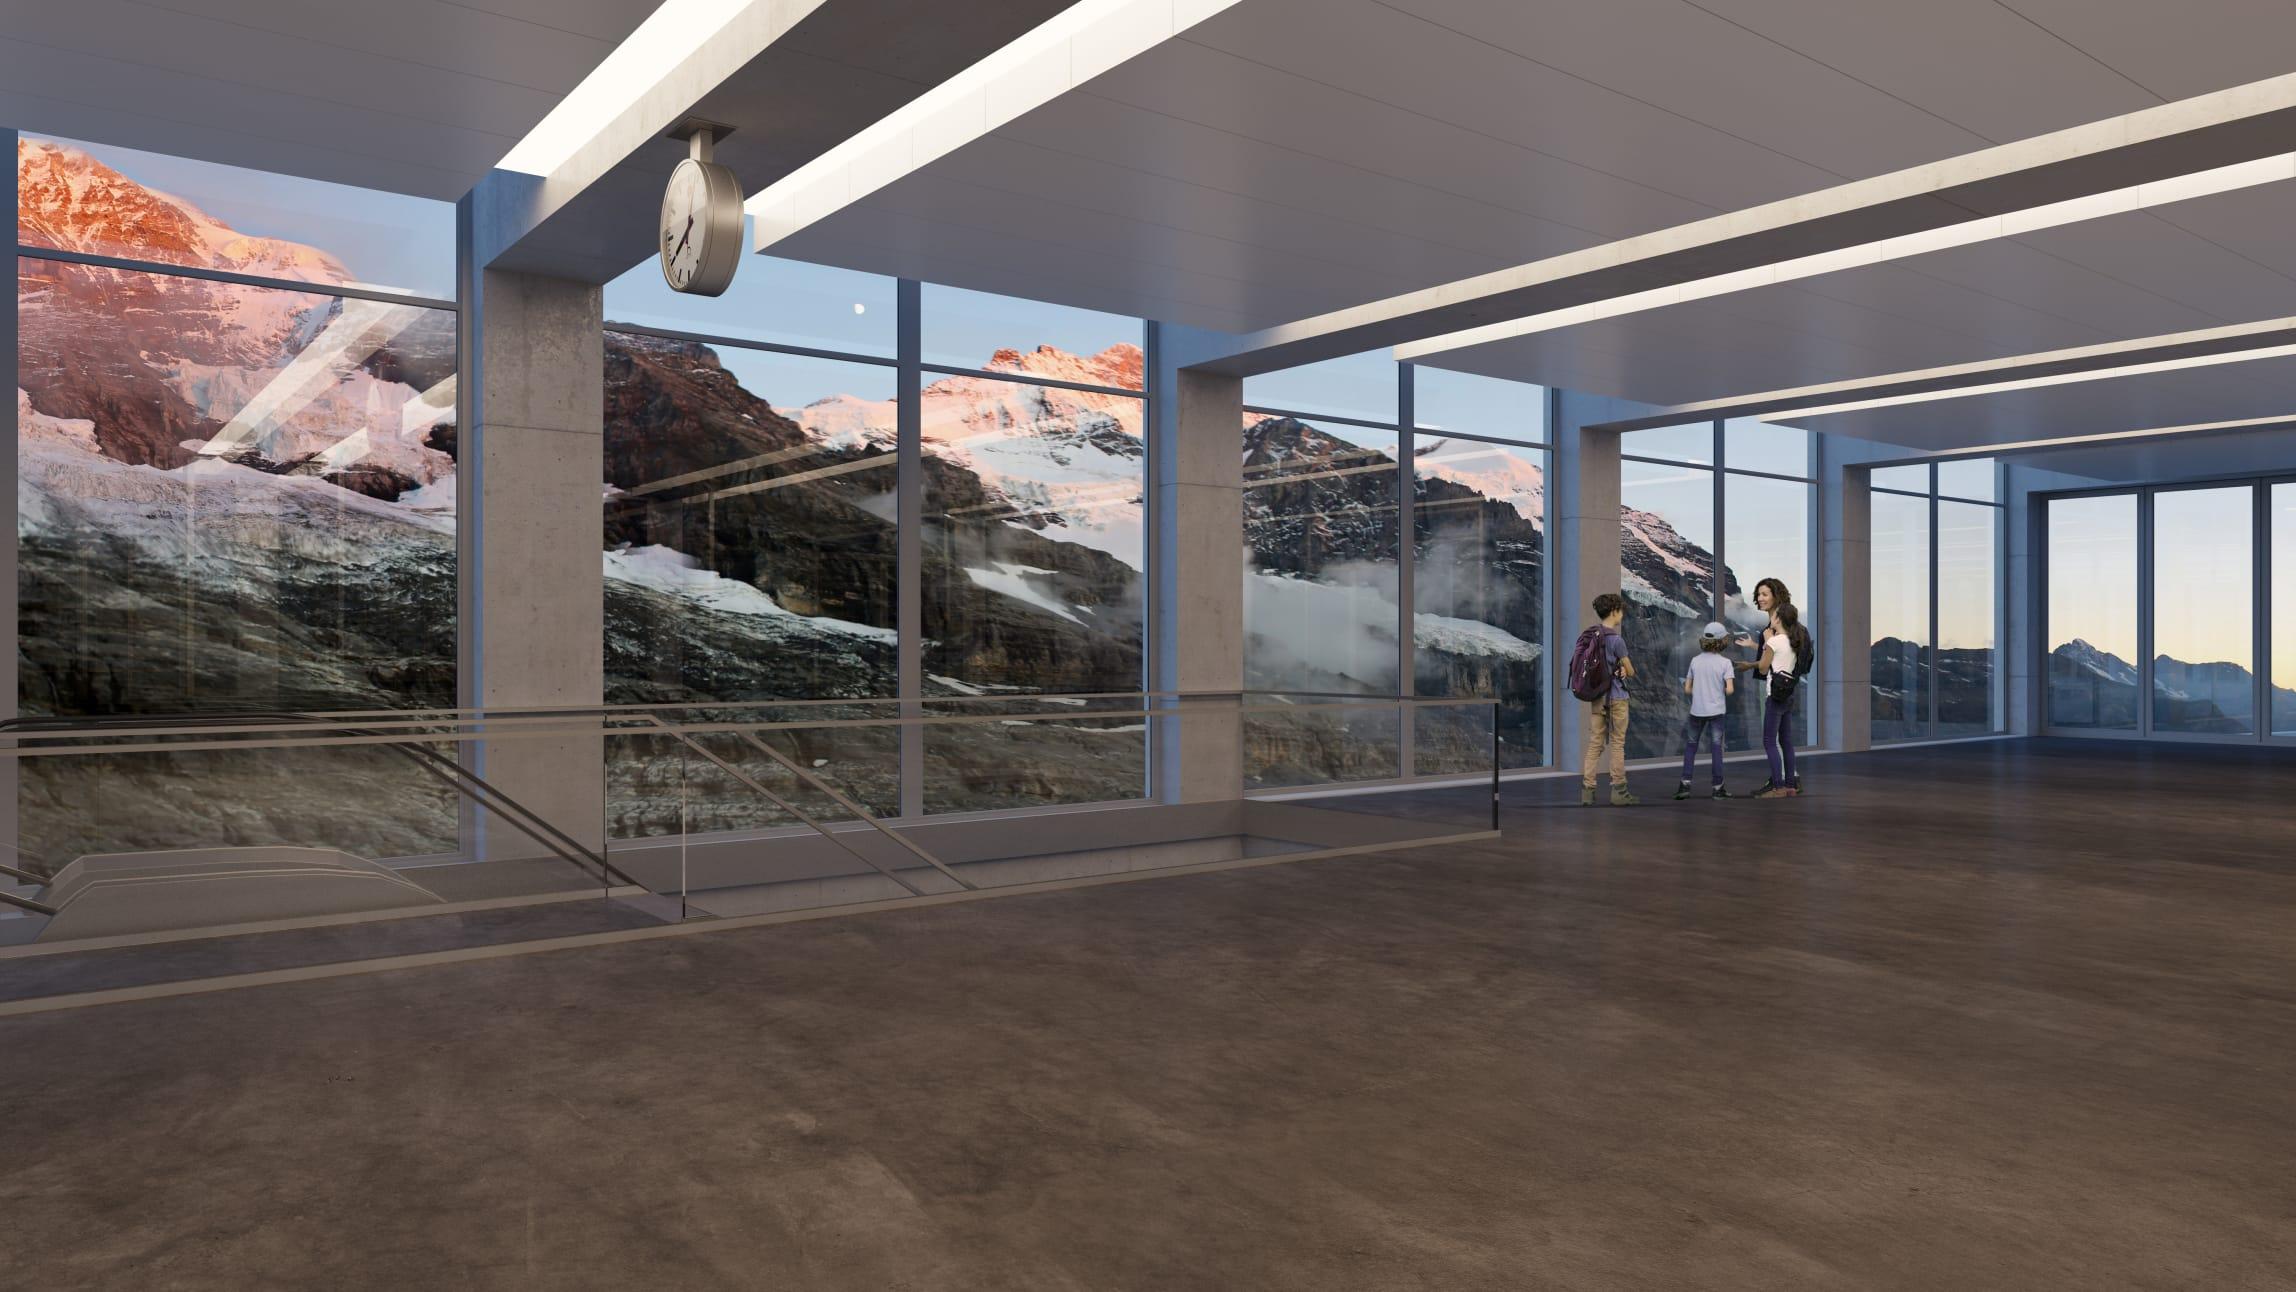 V bahn 3S Eigergletscher Panoramahalle 2